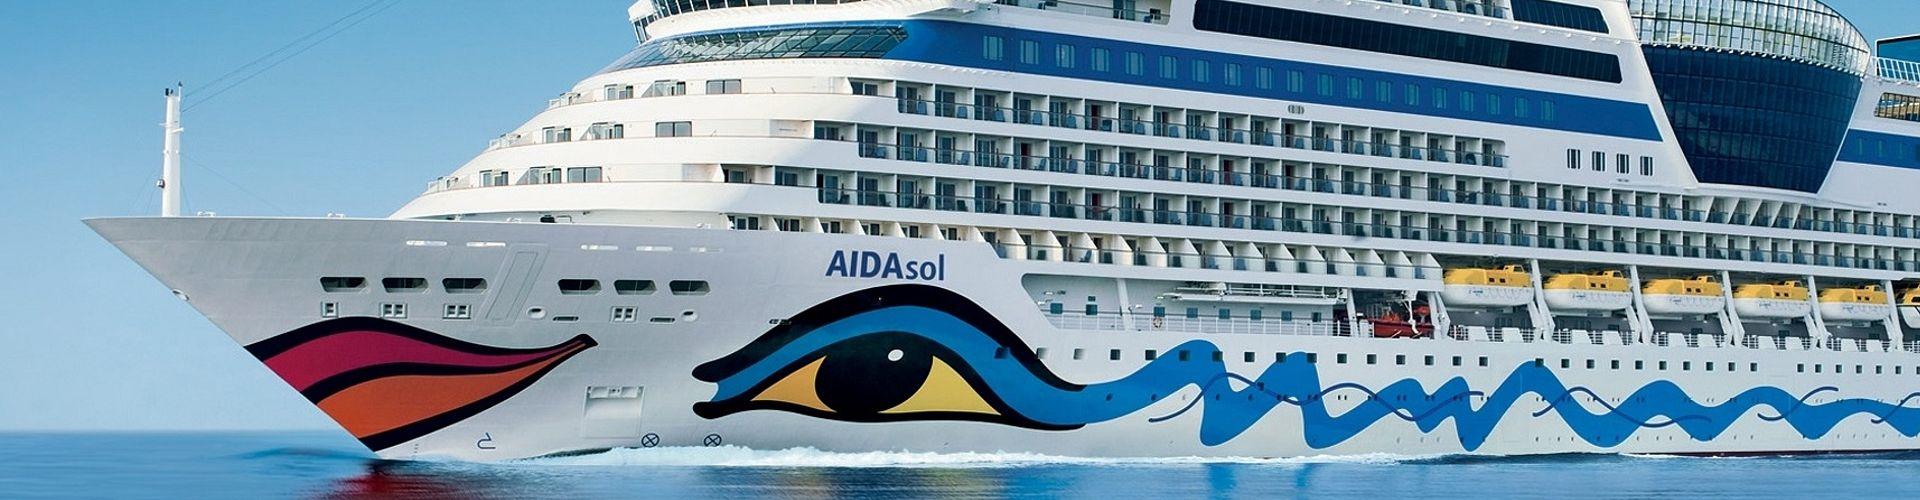 Kurzkreuzfahrt mit AIDAsol ab Hamburg